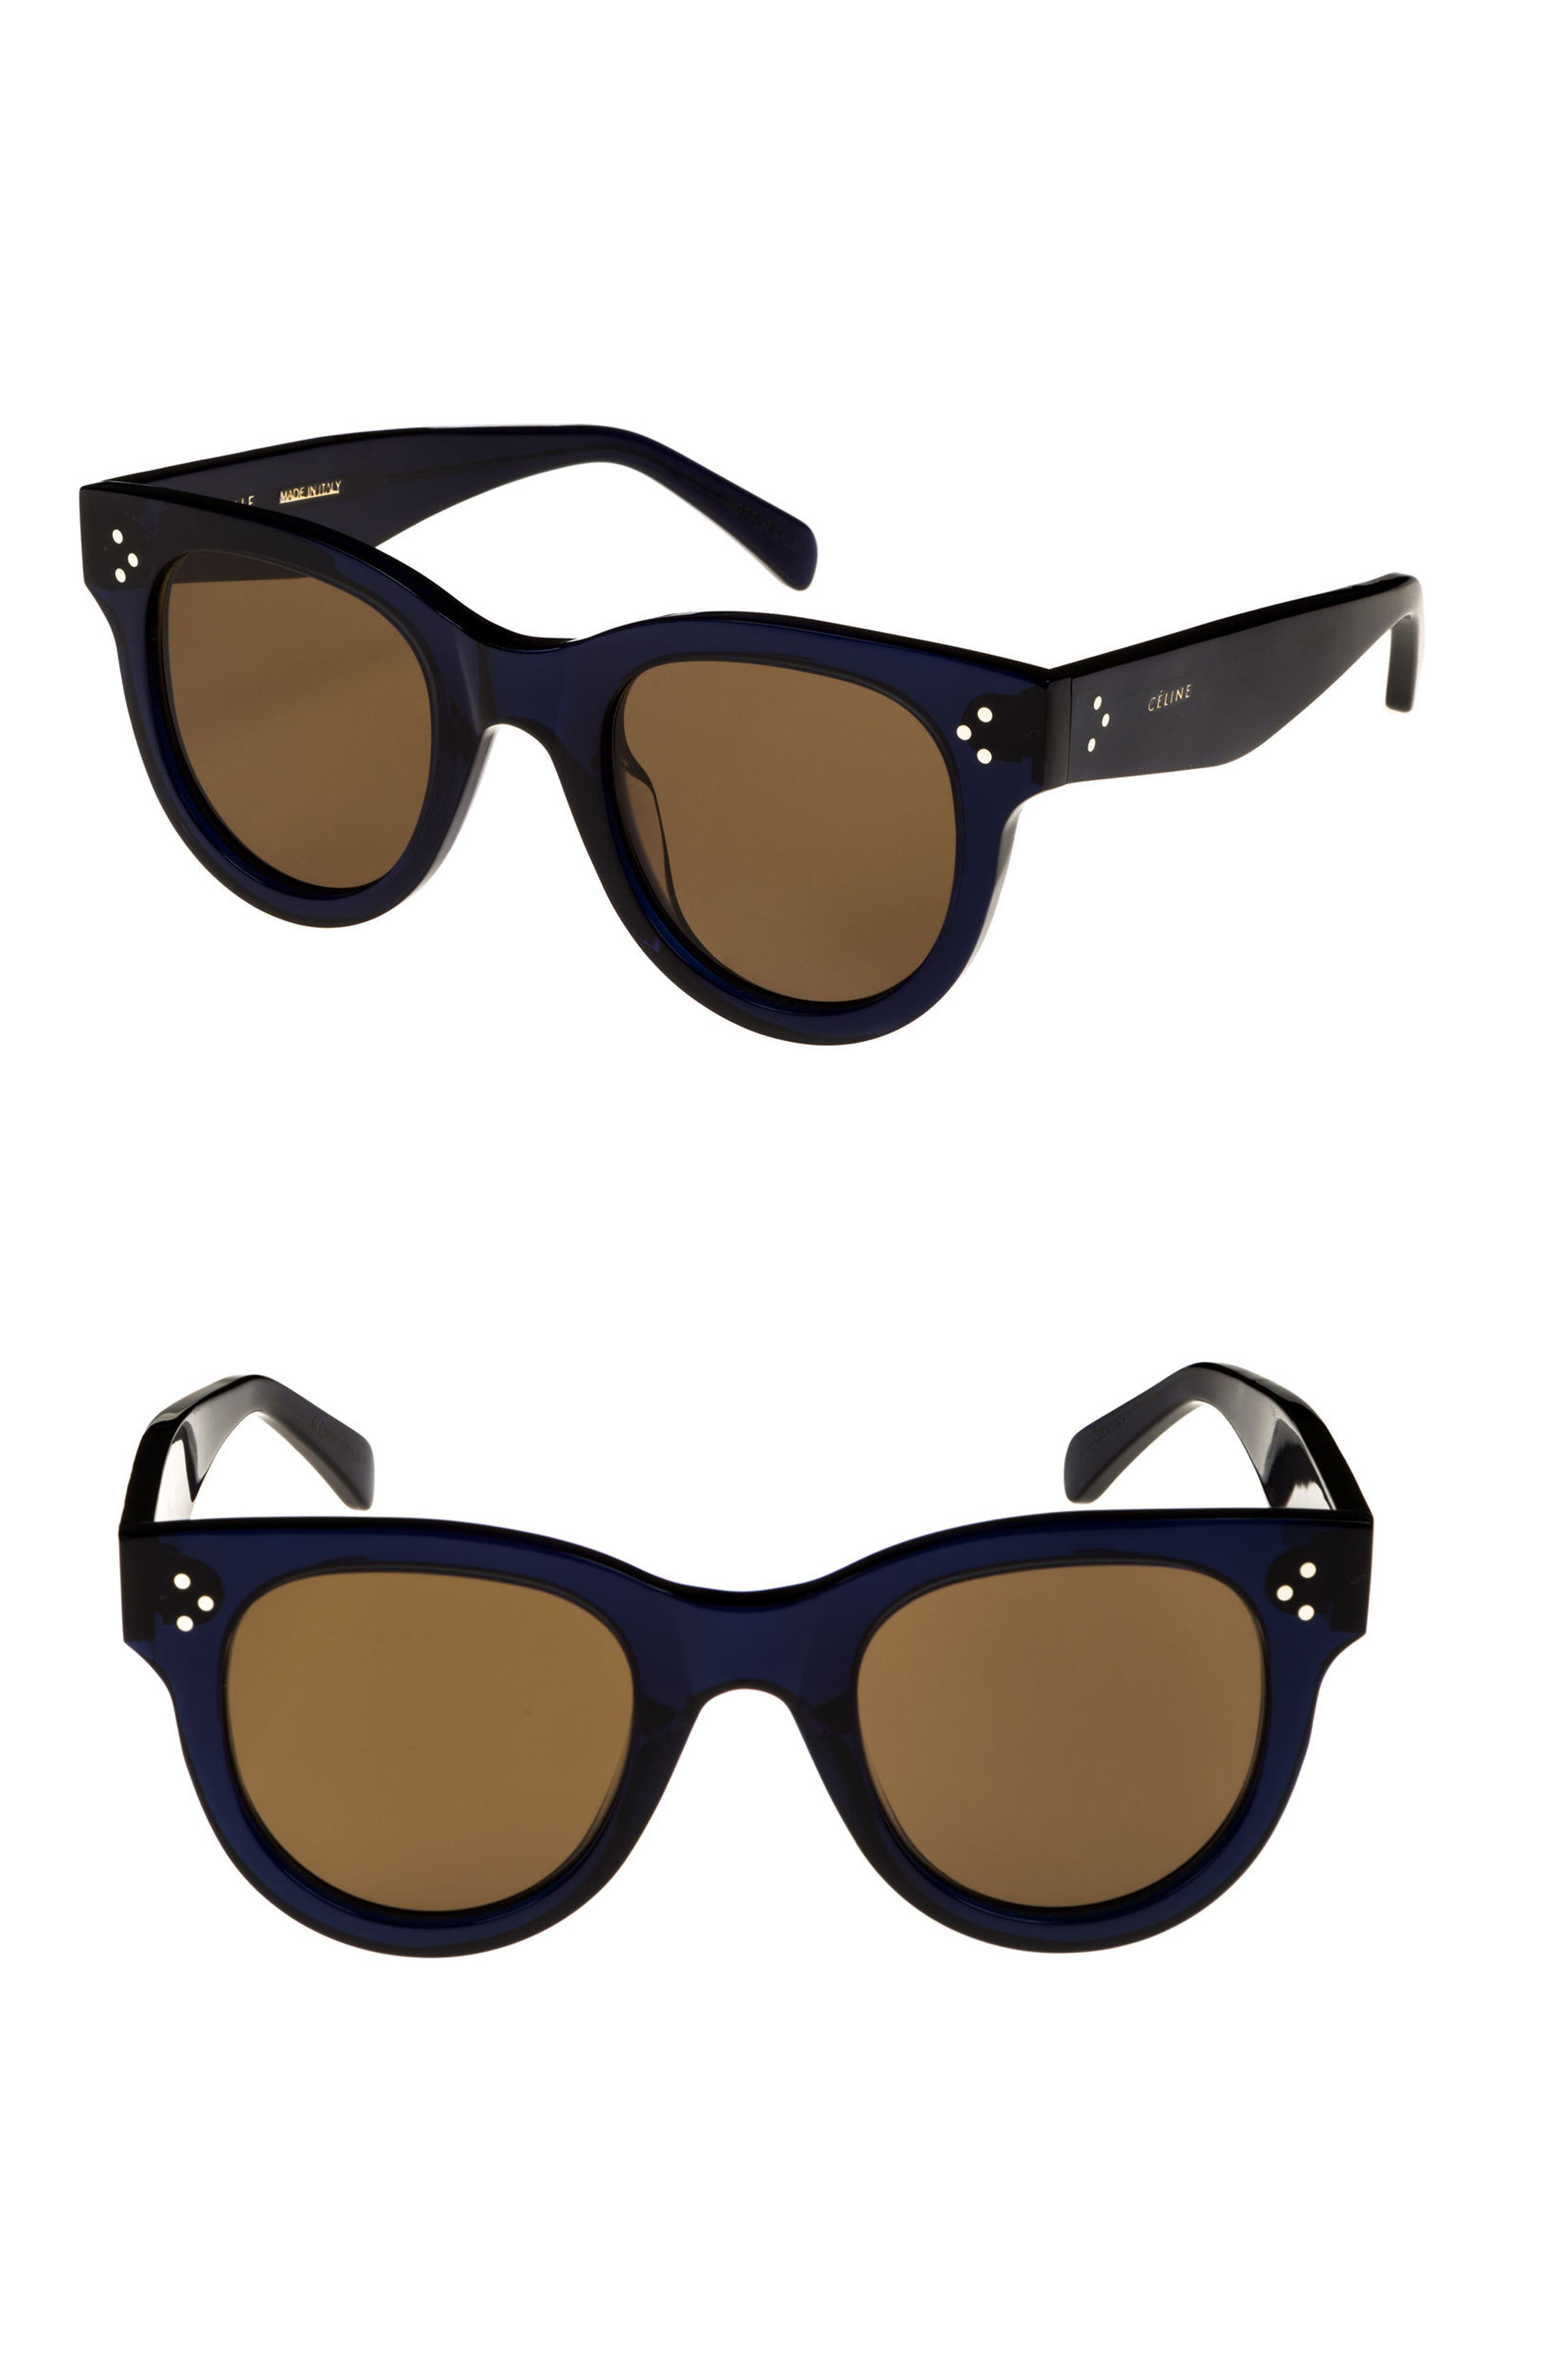 48mm Round Sunglasses,                             Main thumbnail 1, color,